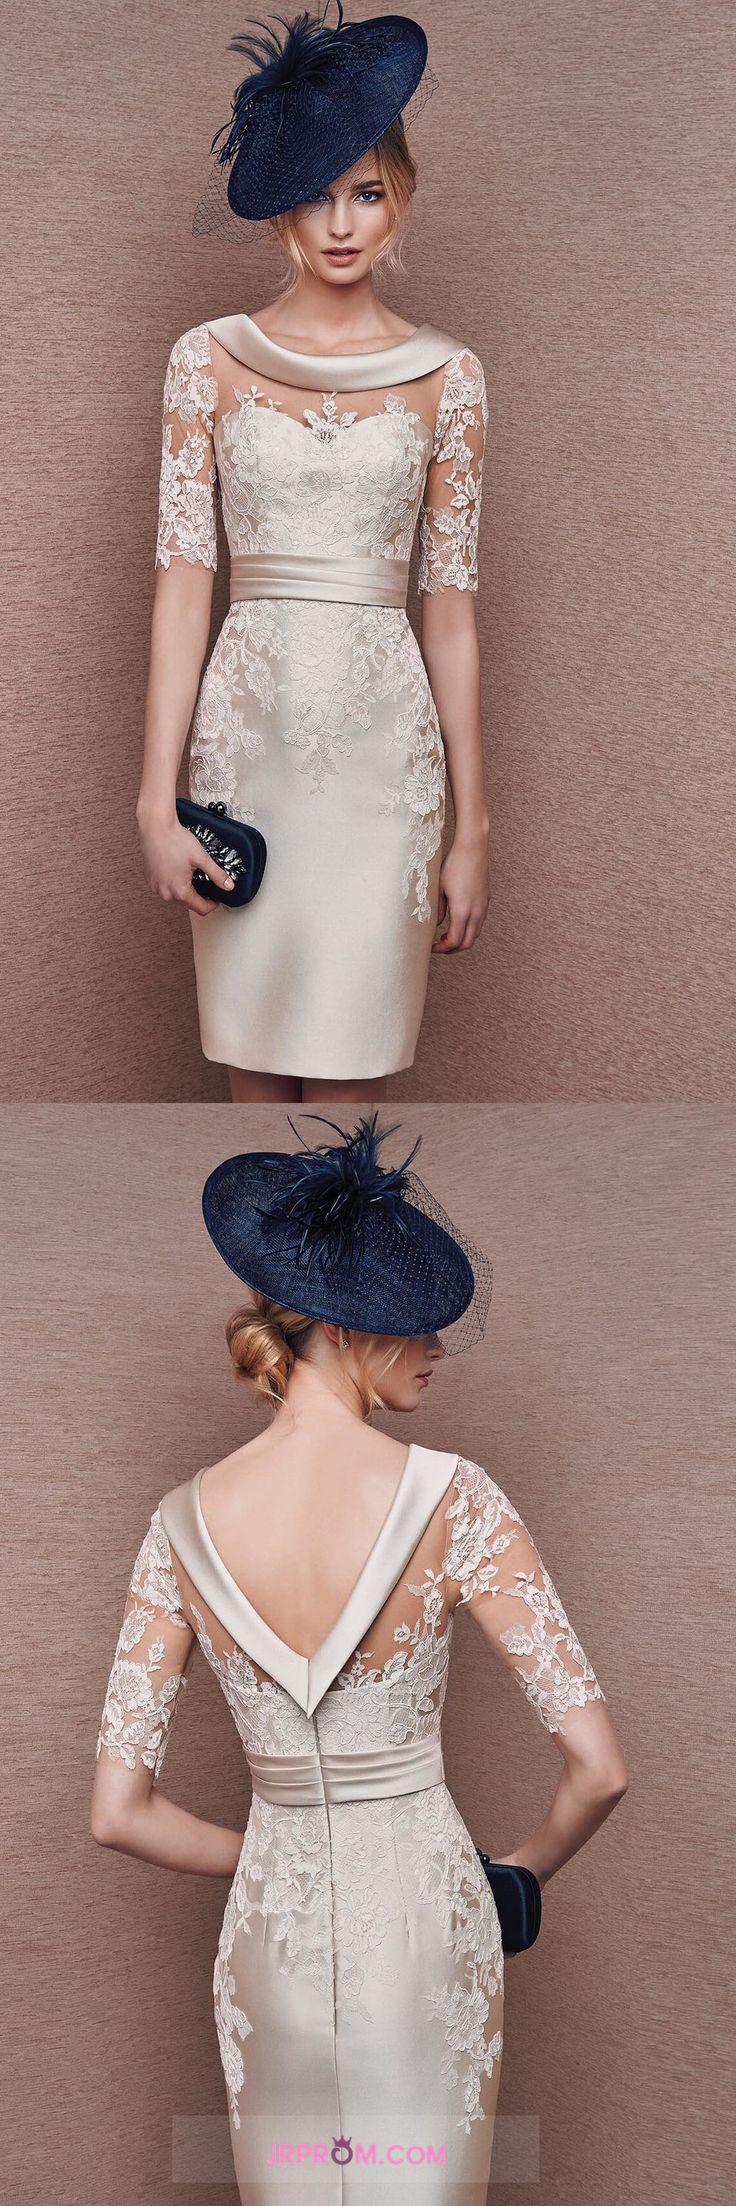 2016 Satin Mother Of The Bride Dresses Cowl Neck Half Sleeve With Applique Item Code:#JRPNCKB7Q9